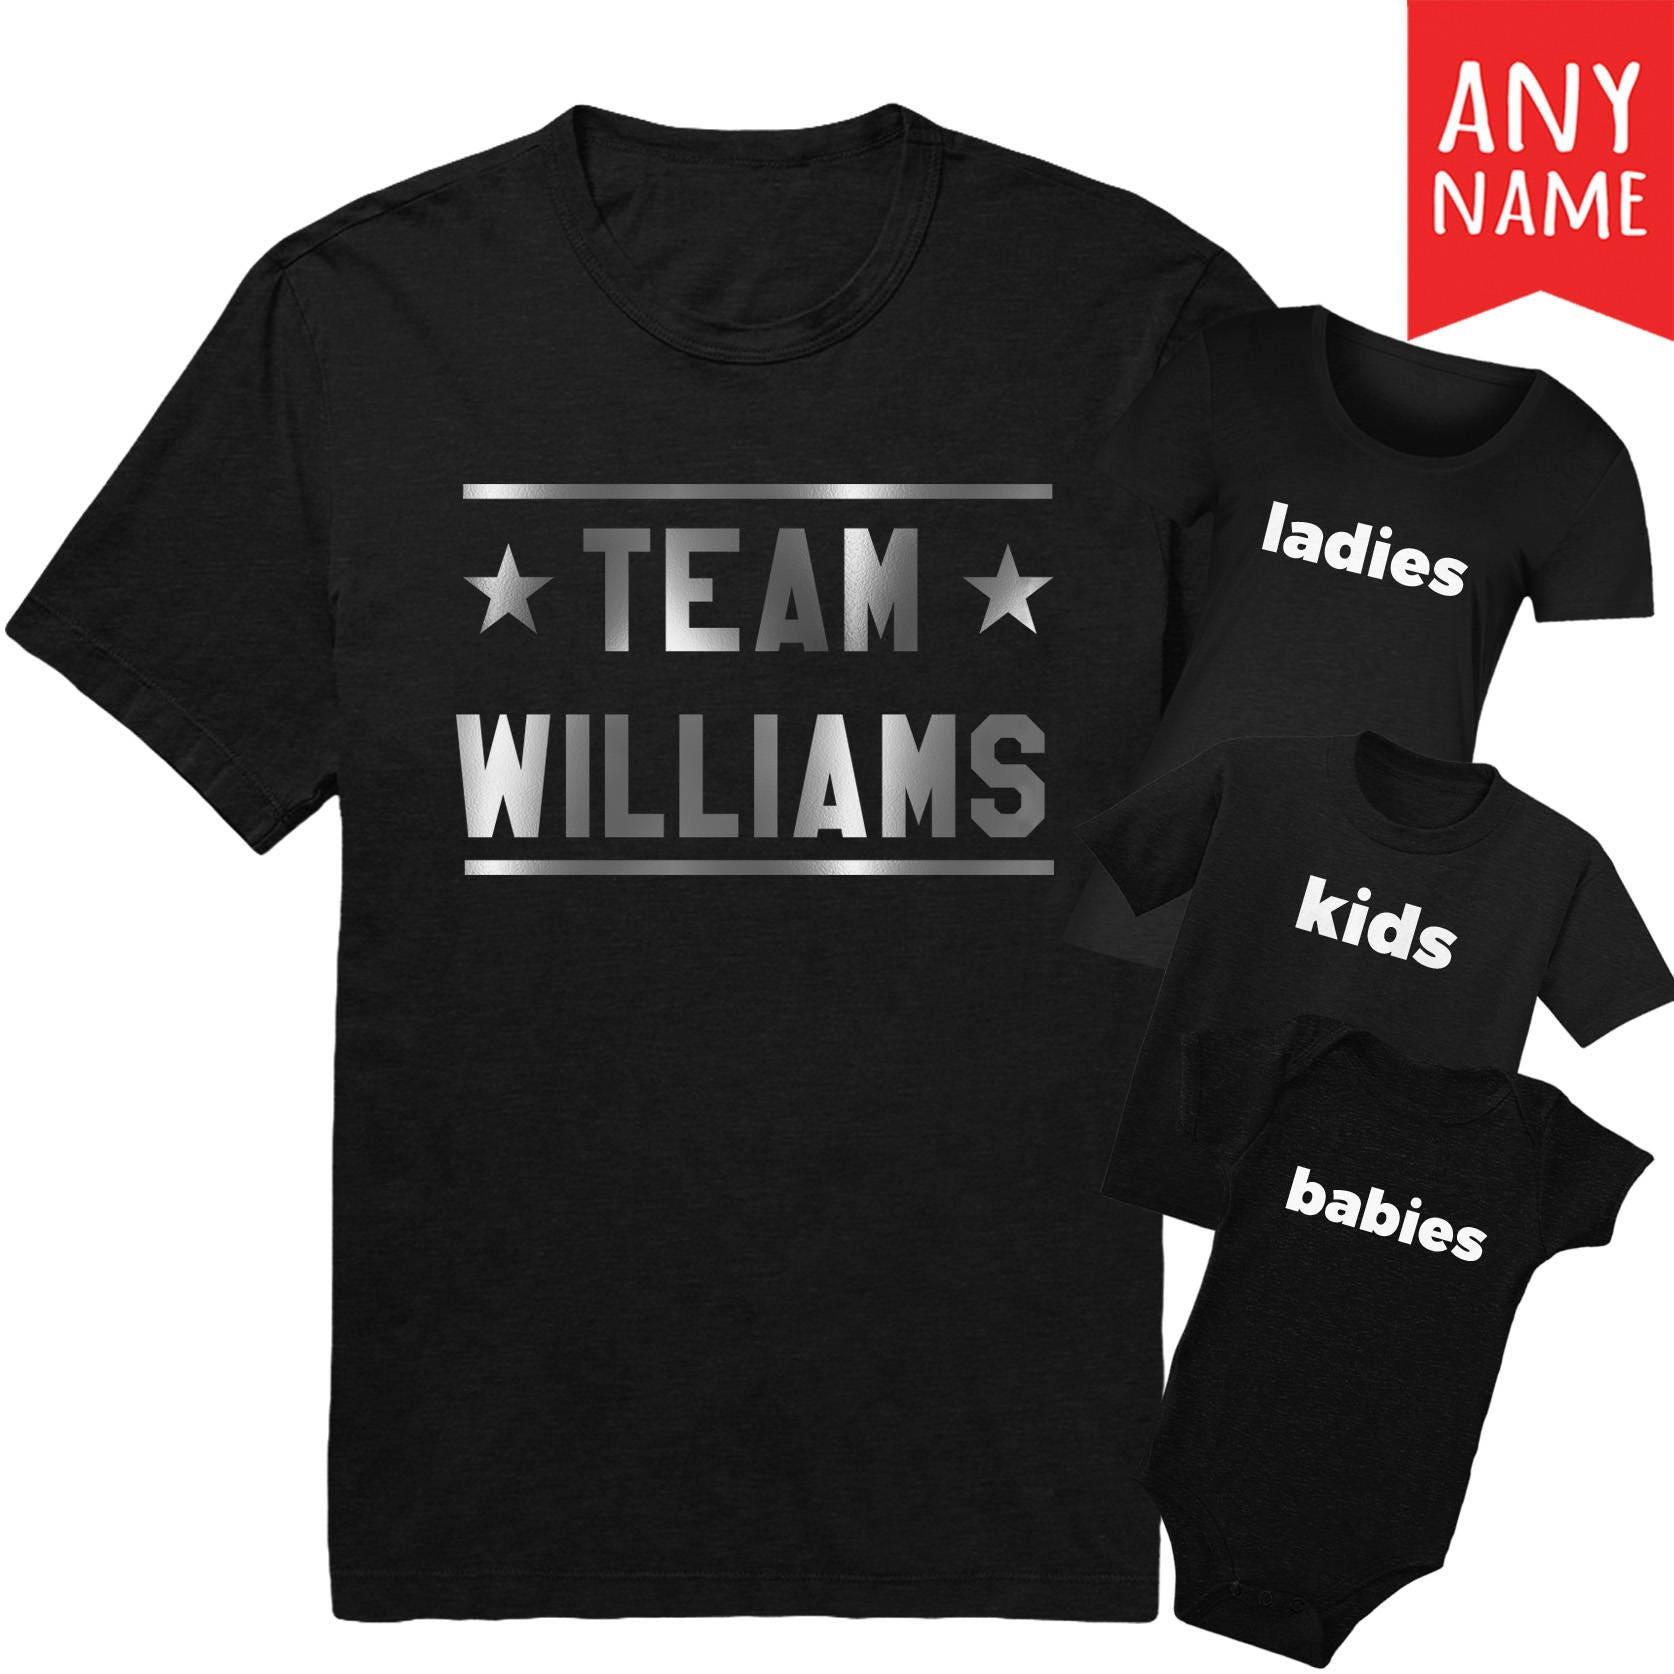 Star team family matching custom t shirts family reunion for Custom t shirts for teams